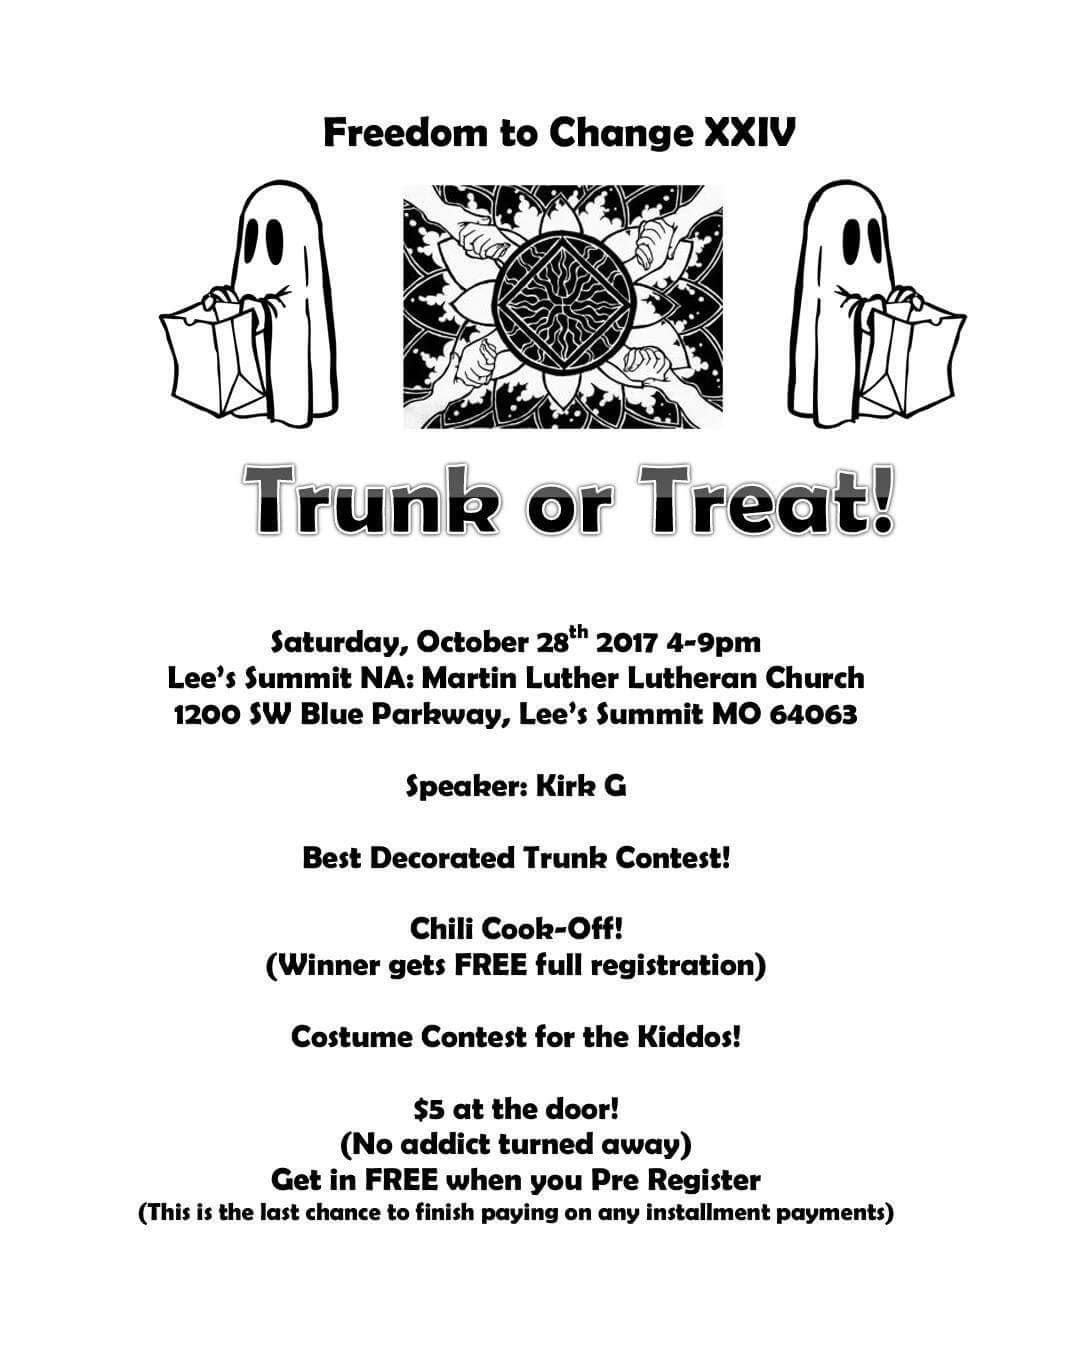 FTC XXIV, Trunk or Treat, Oct 28th, 2017